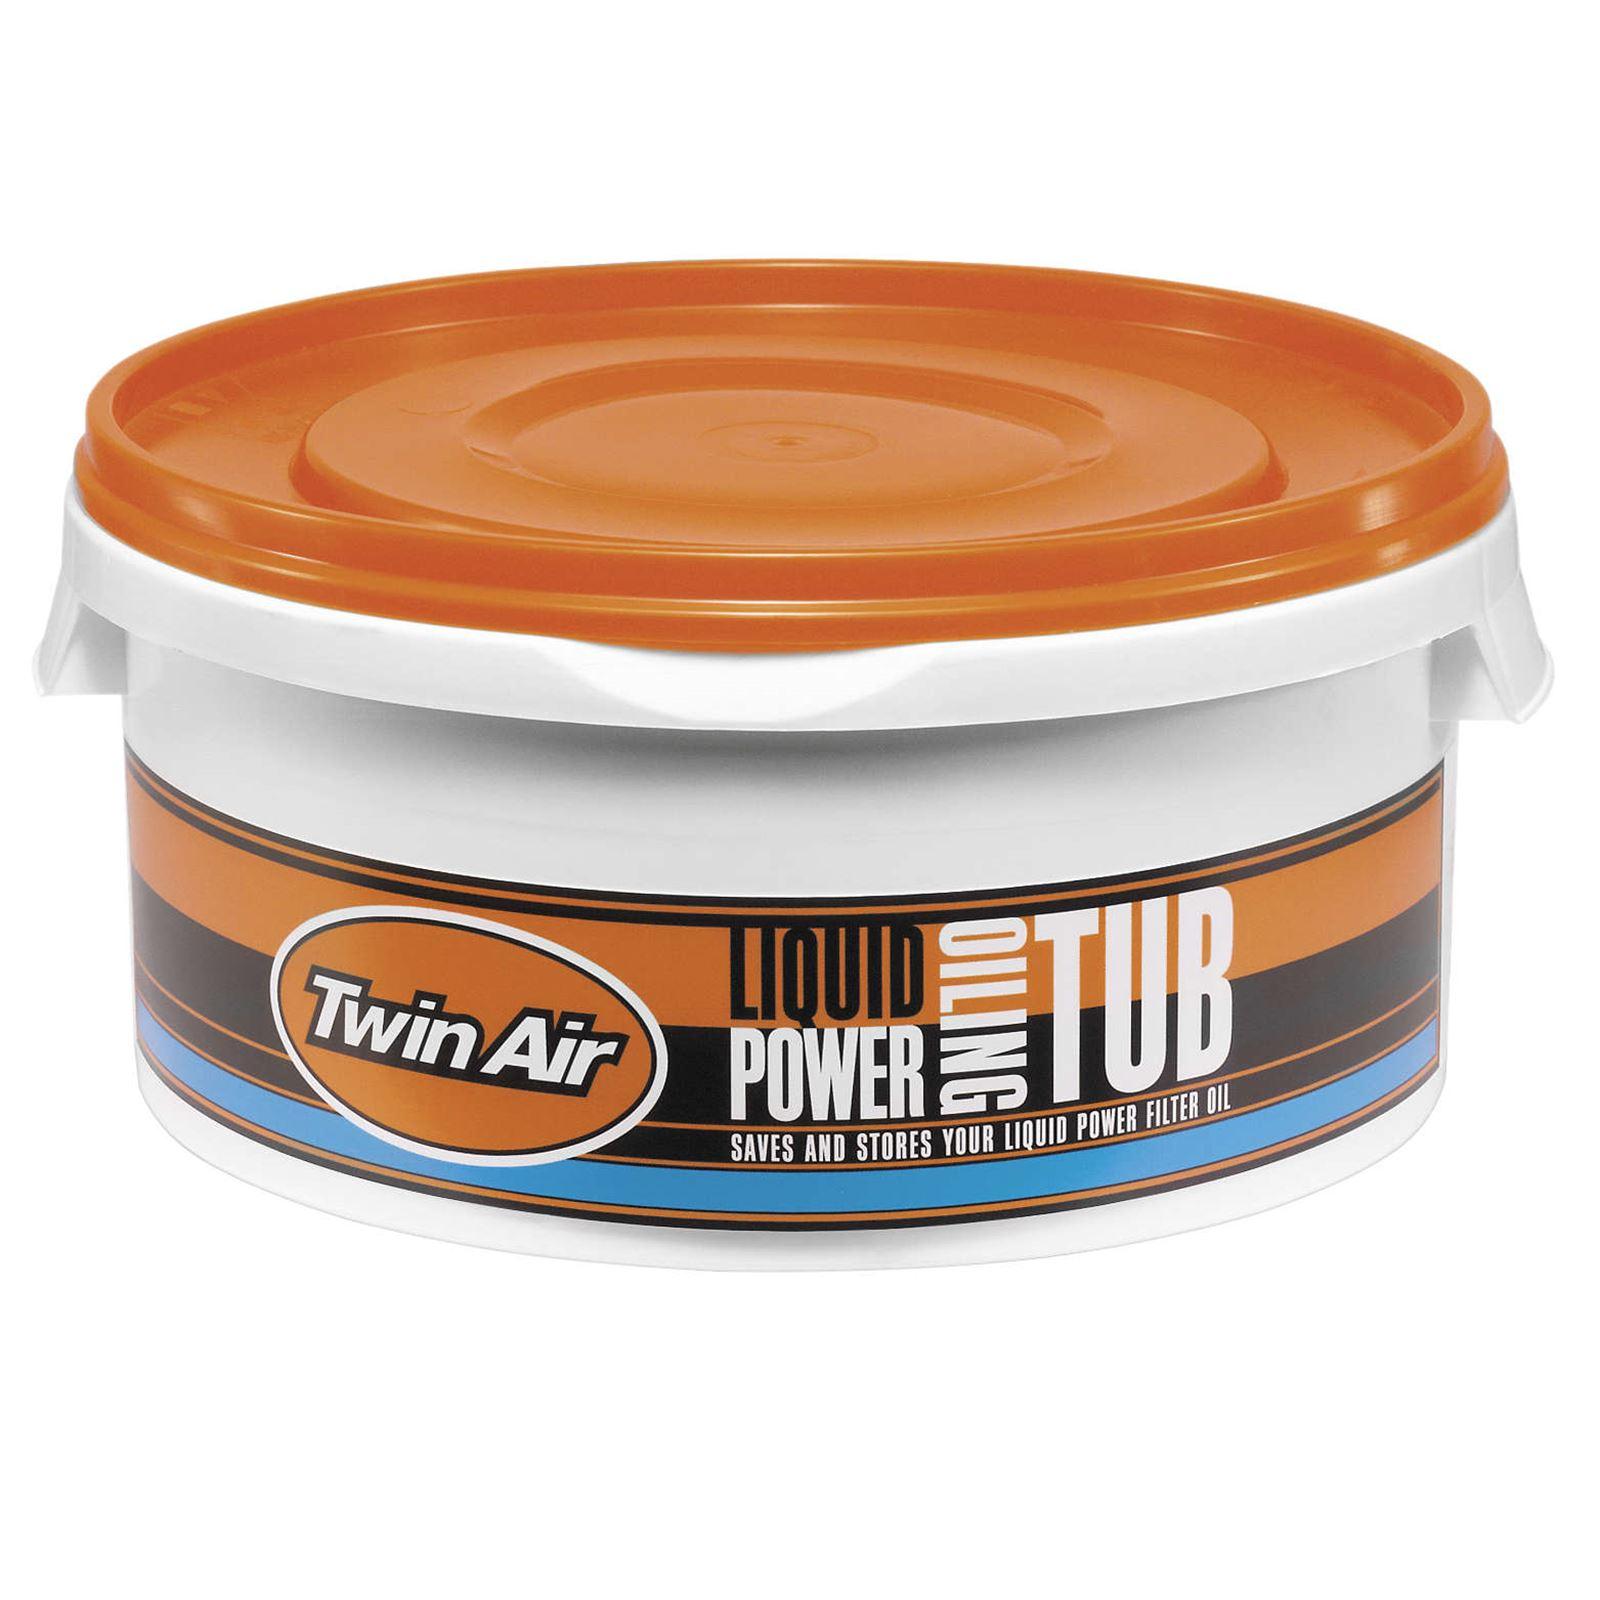 Twin Air Oiling Tub